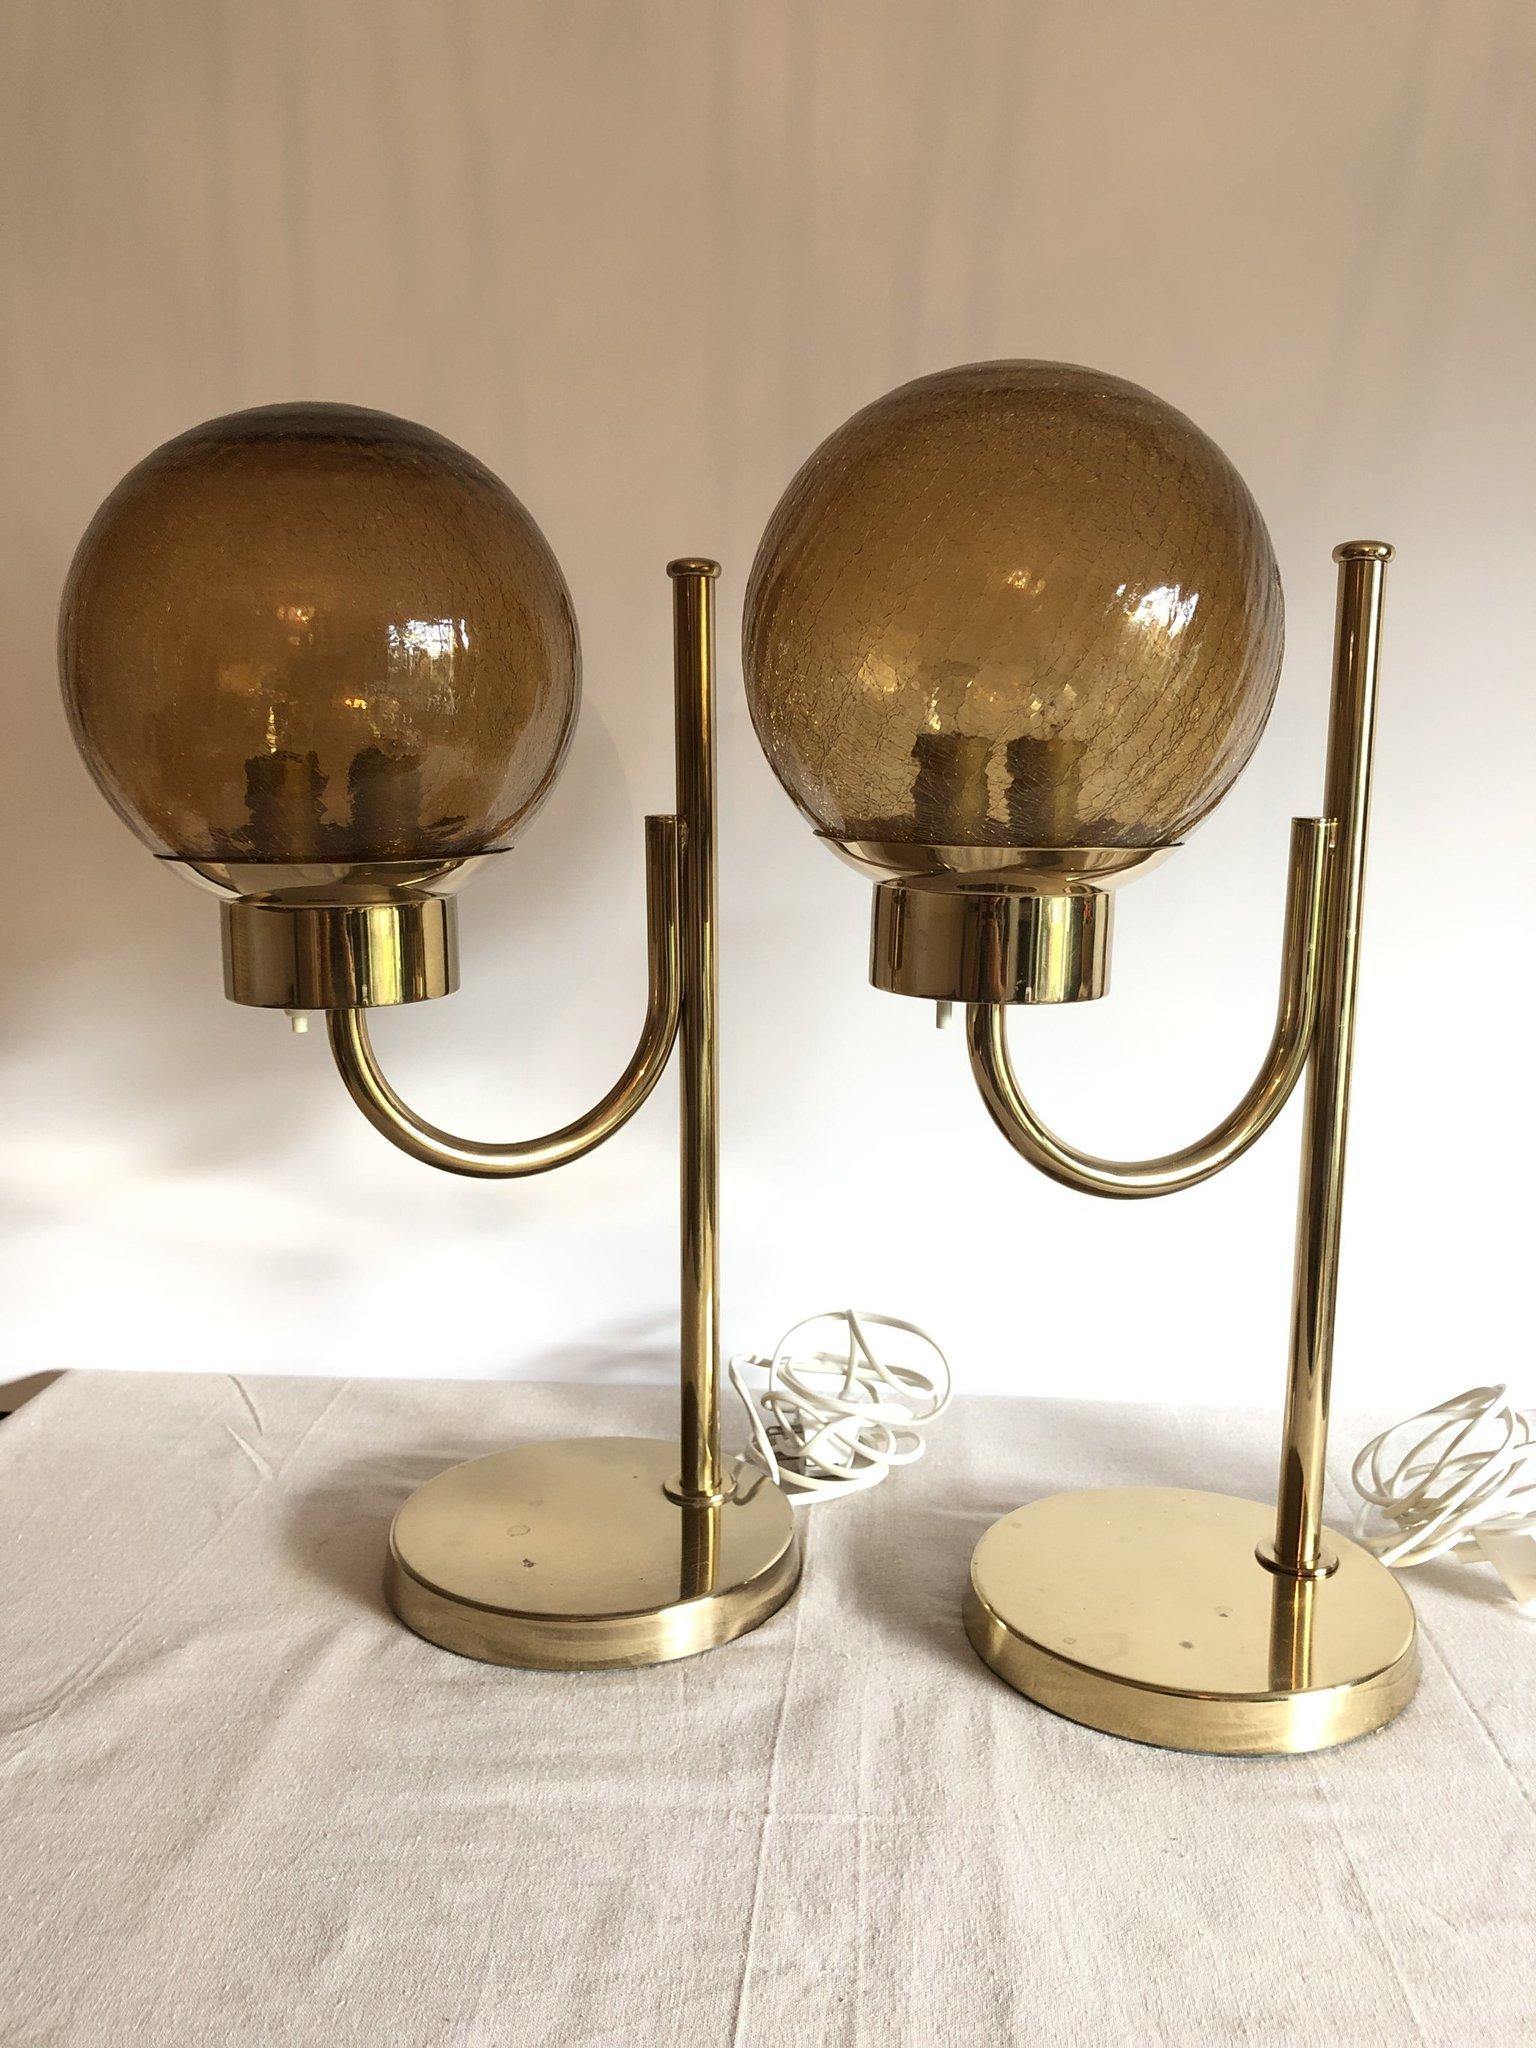 Nykomna Bergboms bordslampa bordslampor retro mässing g.. (361039216) ᐈ HI-22